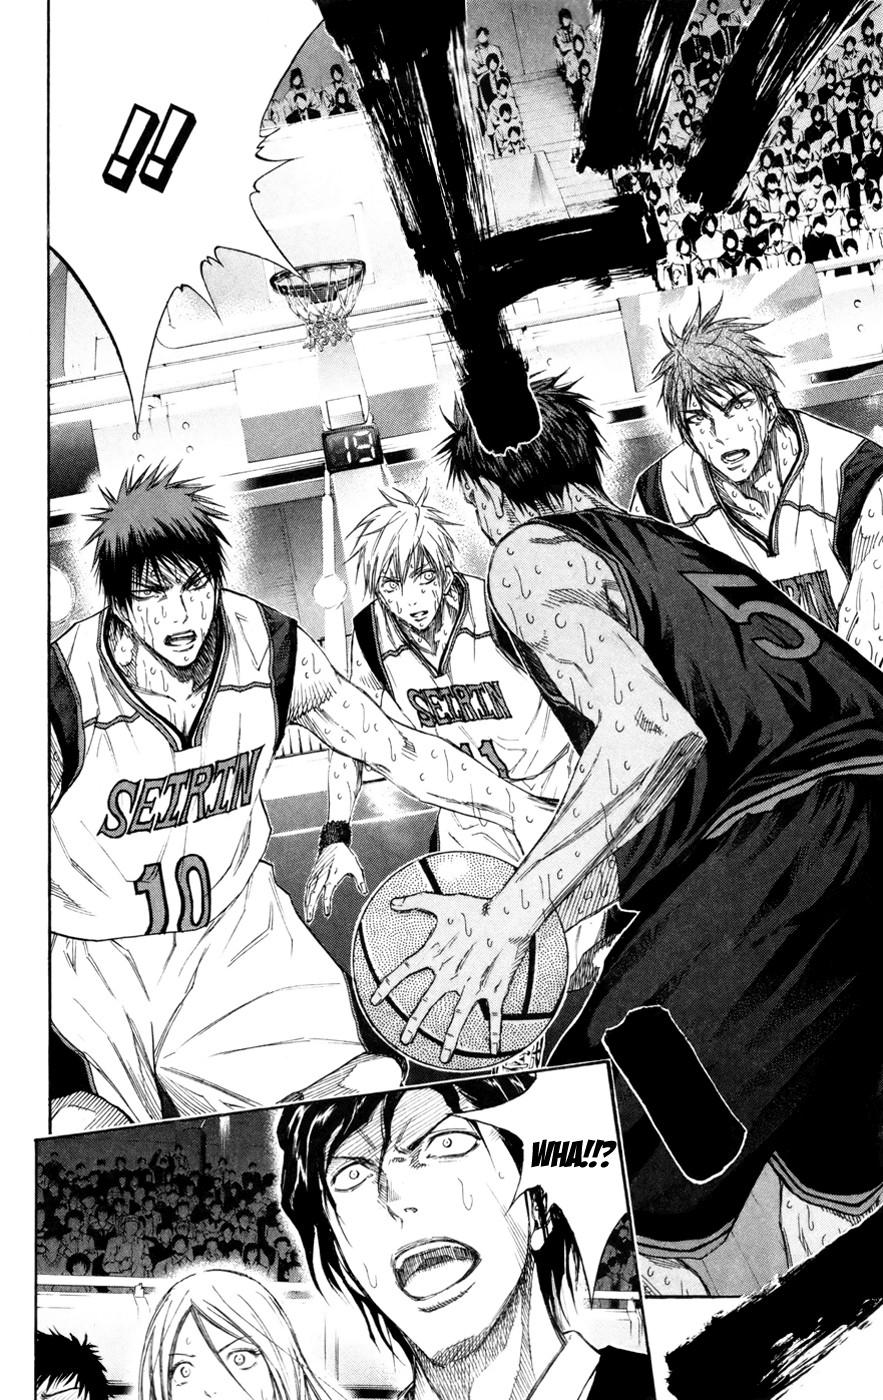 Kuroko no Basket Manga Chapter 131 - Image 17